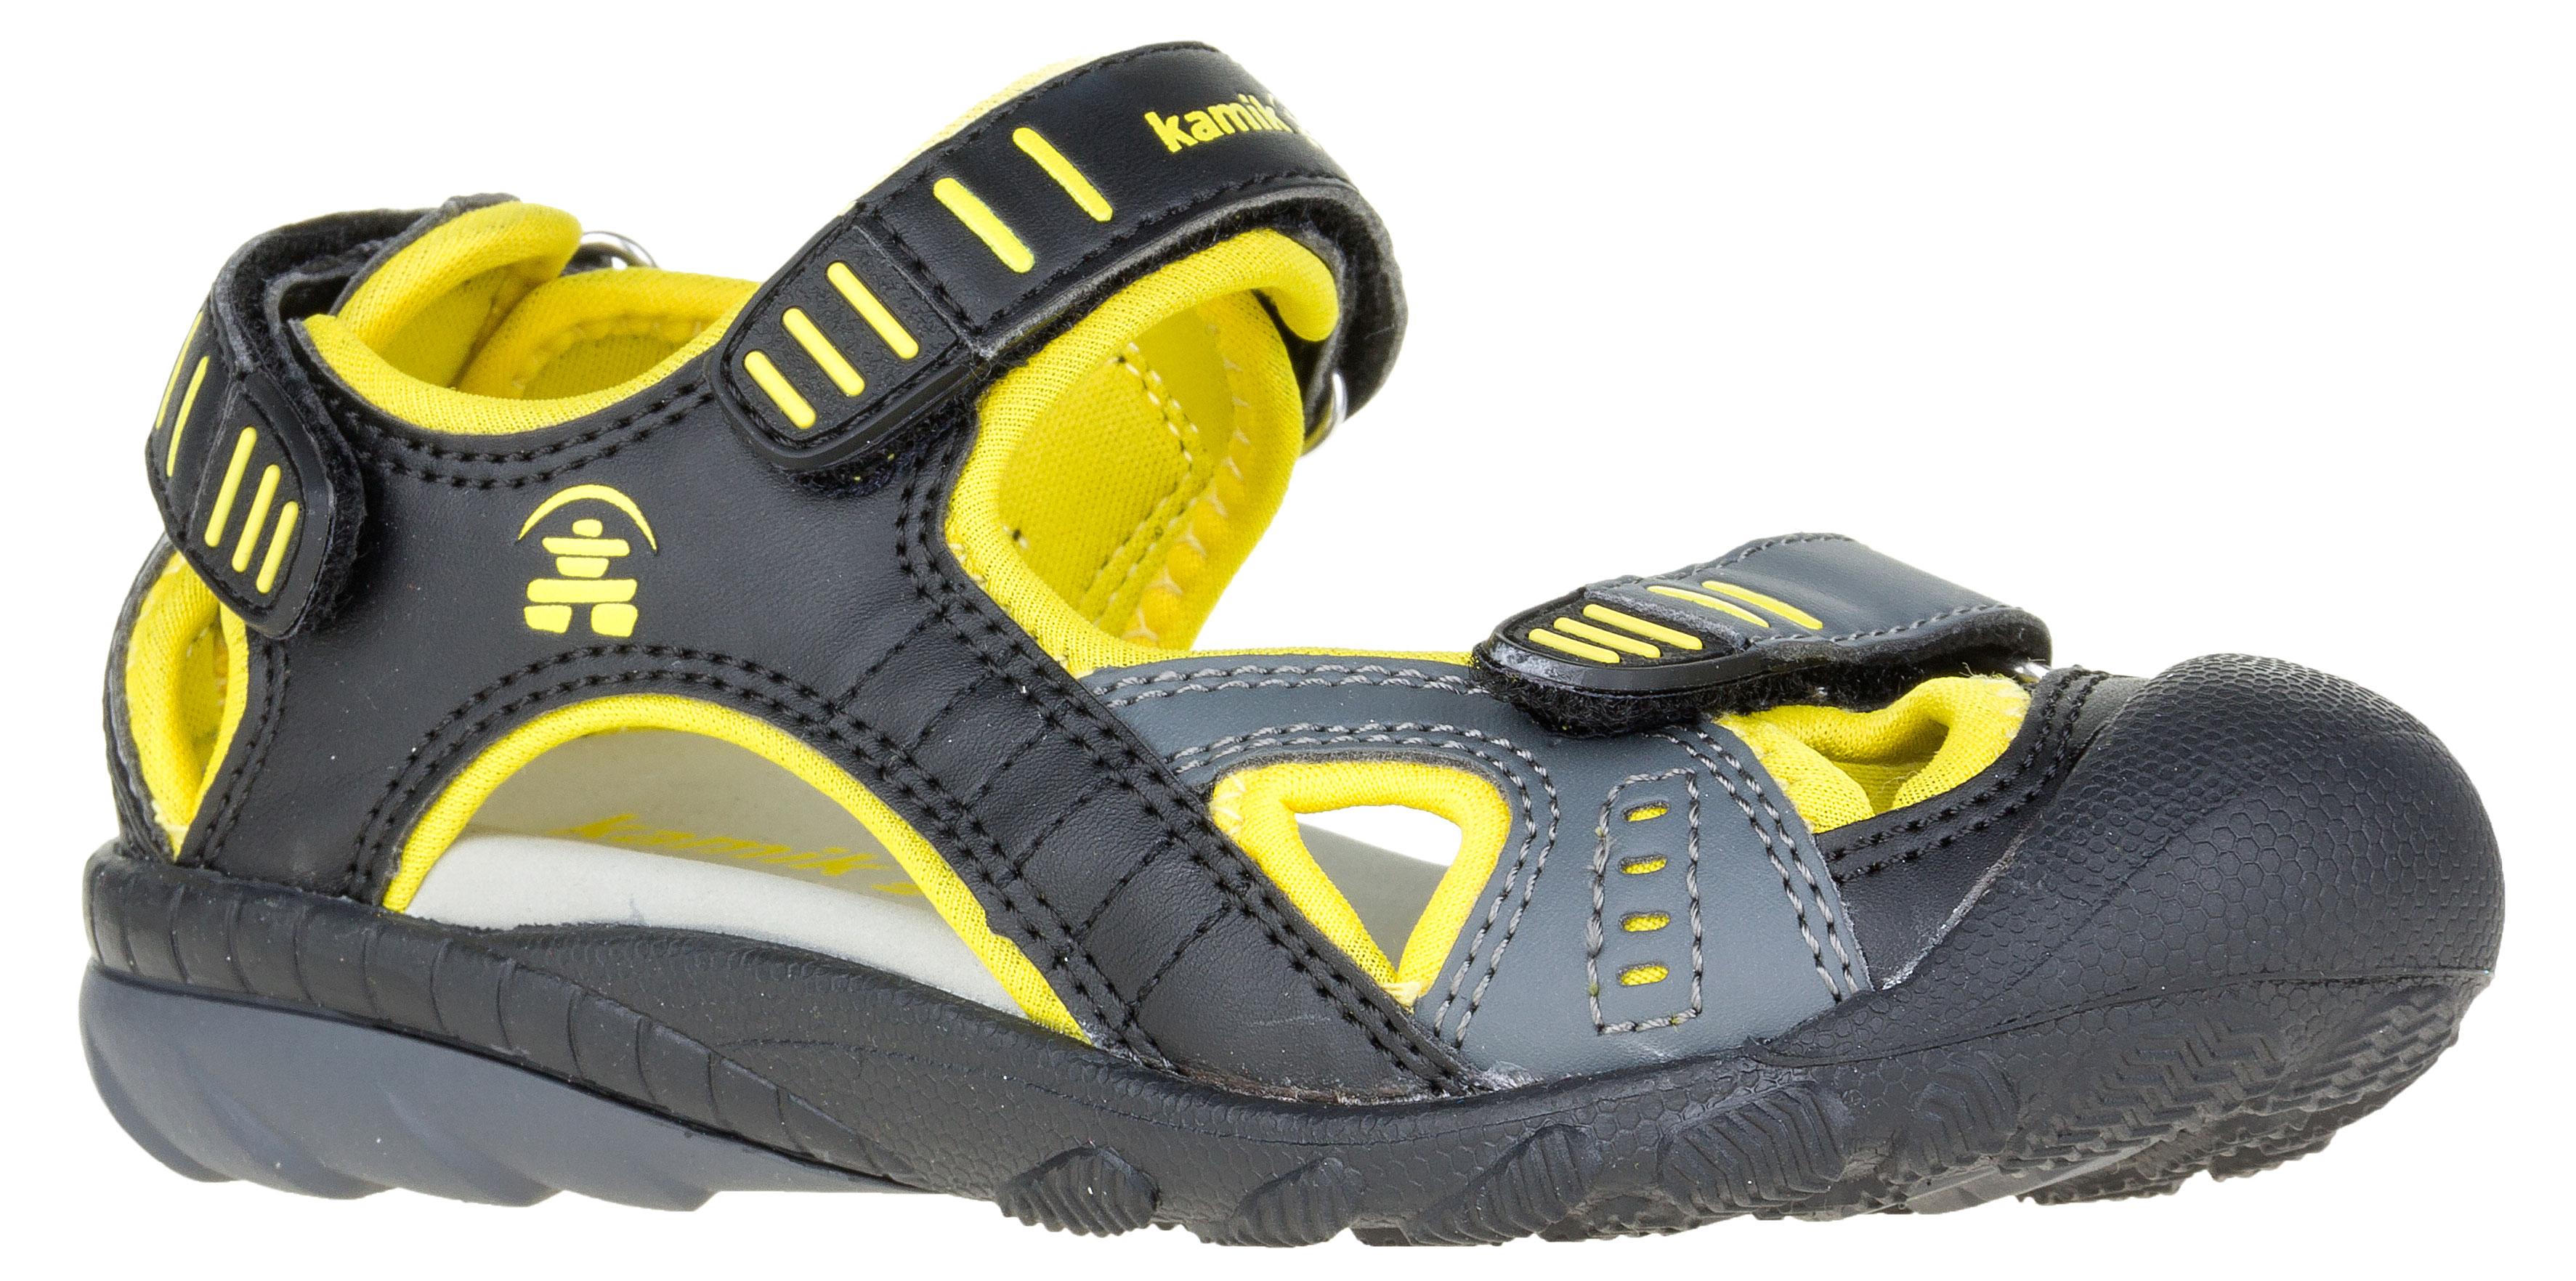 e07c609a20e0 Kamik Detské sandále - žlto-čierne